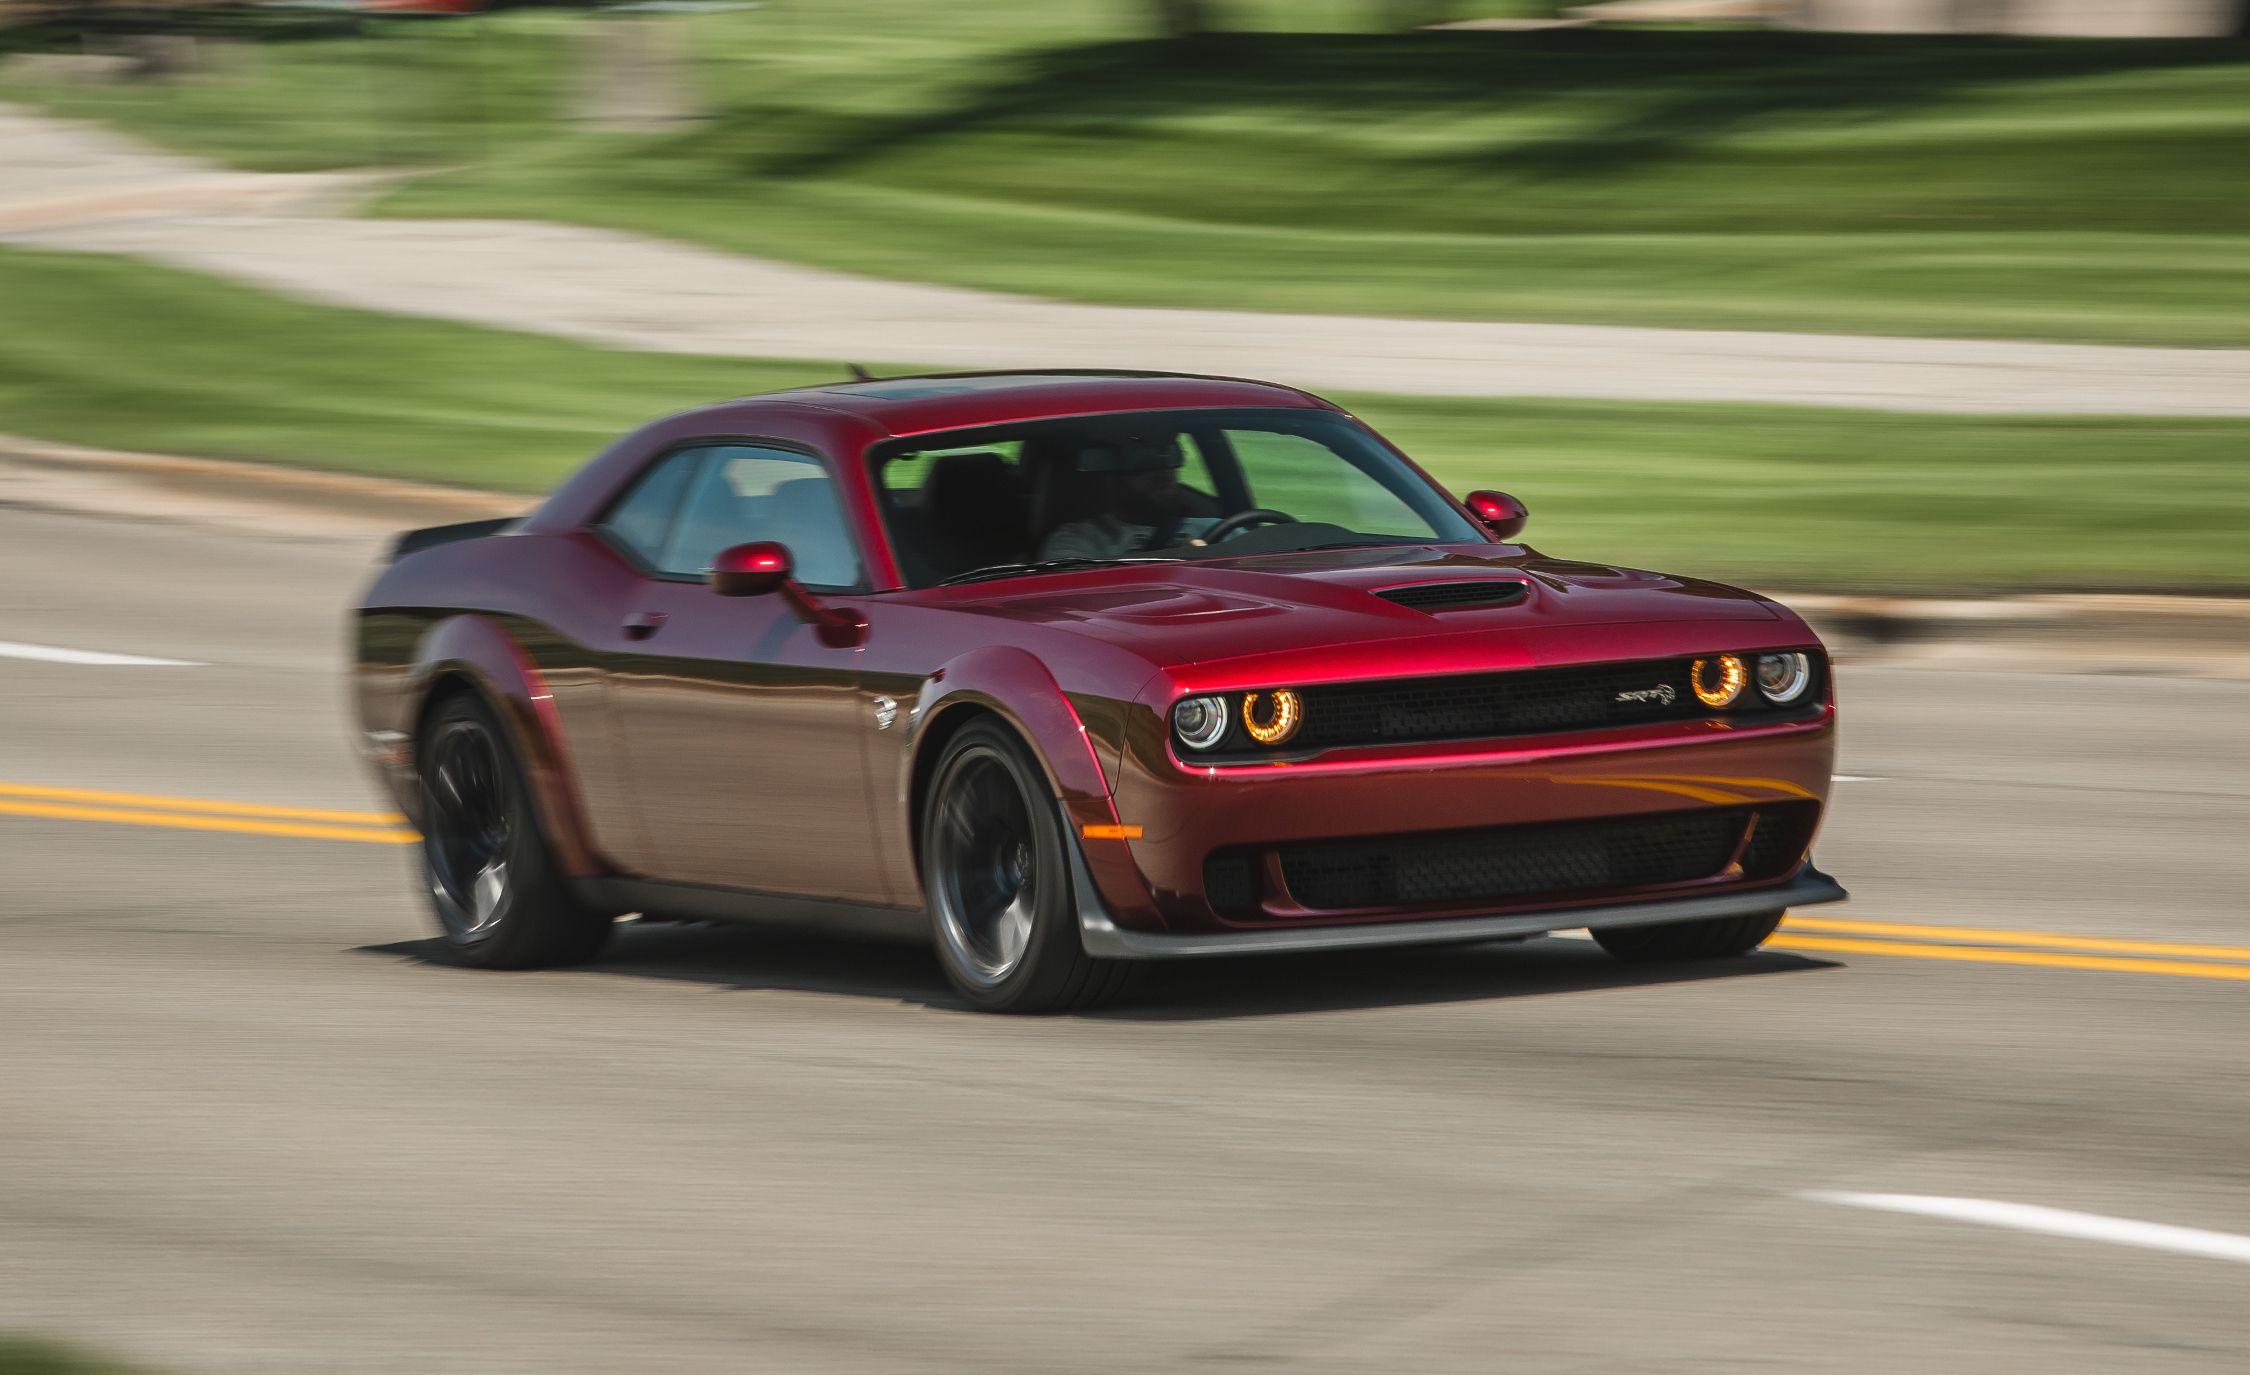 Tested 2018 Dodge Challenger Srt Hellcat Widebody Manual